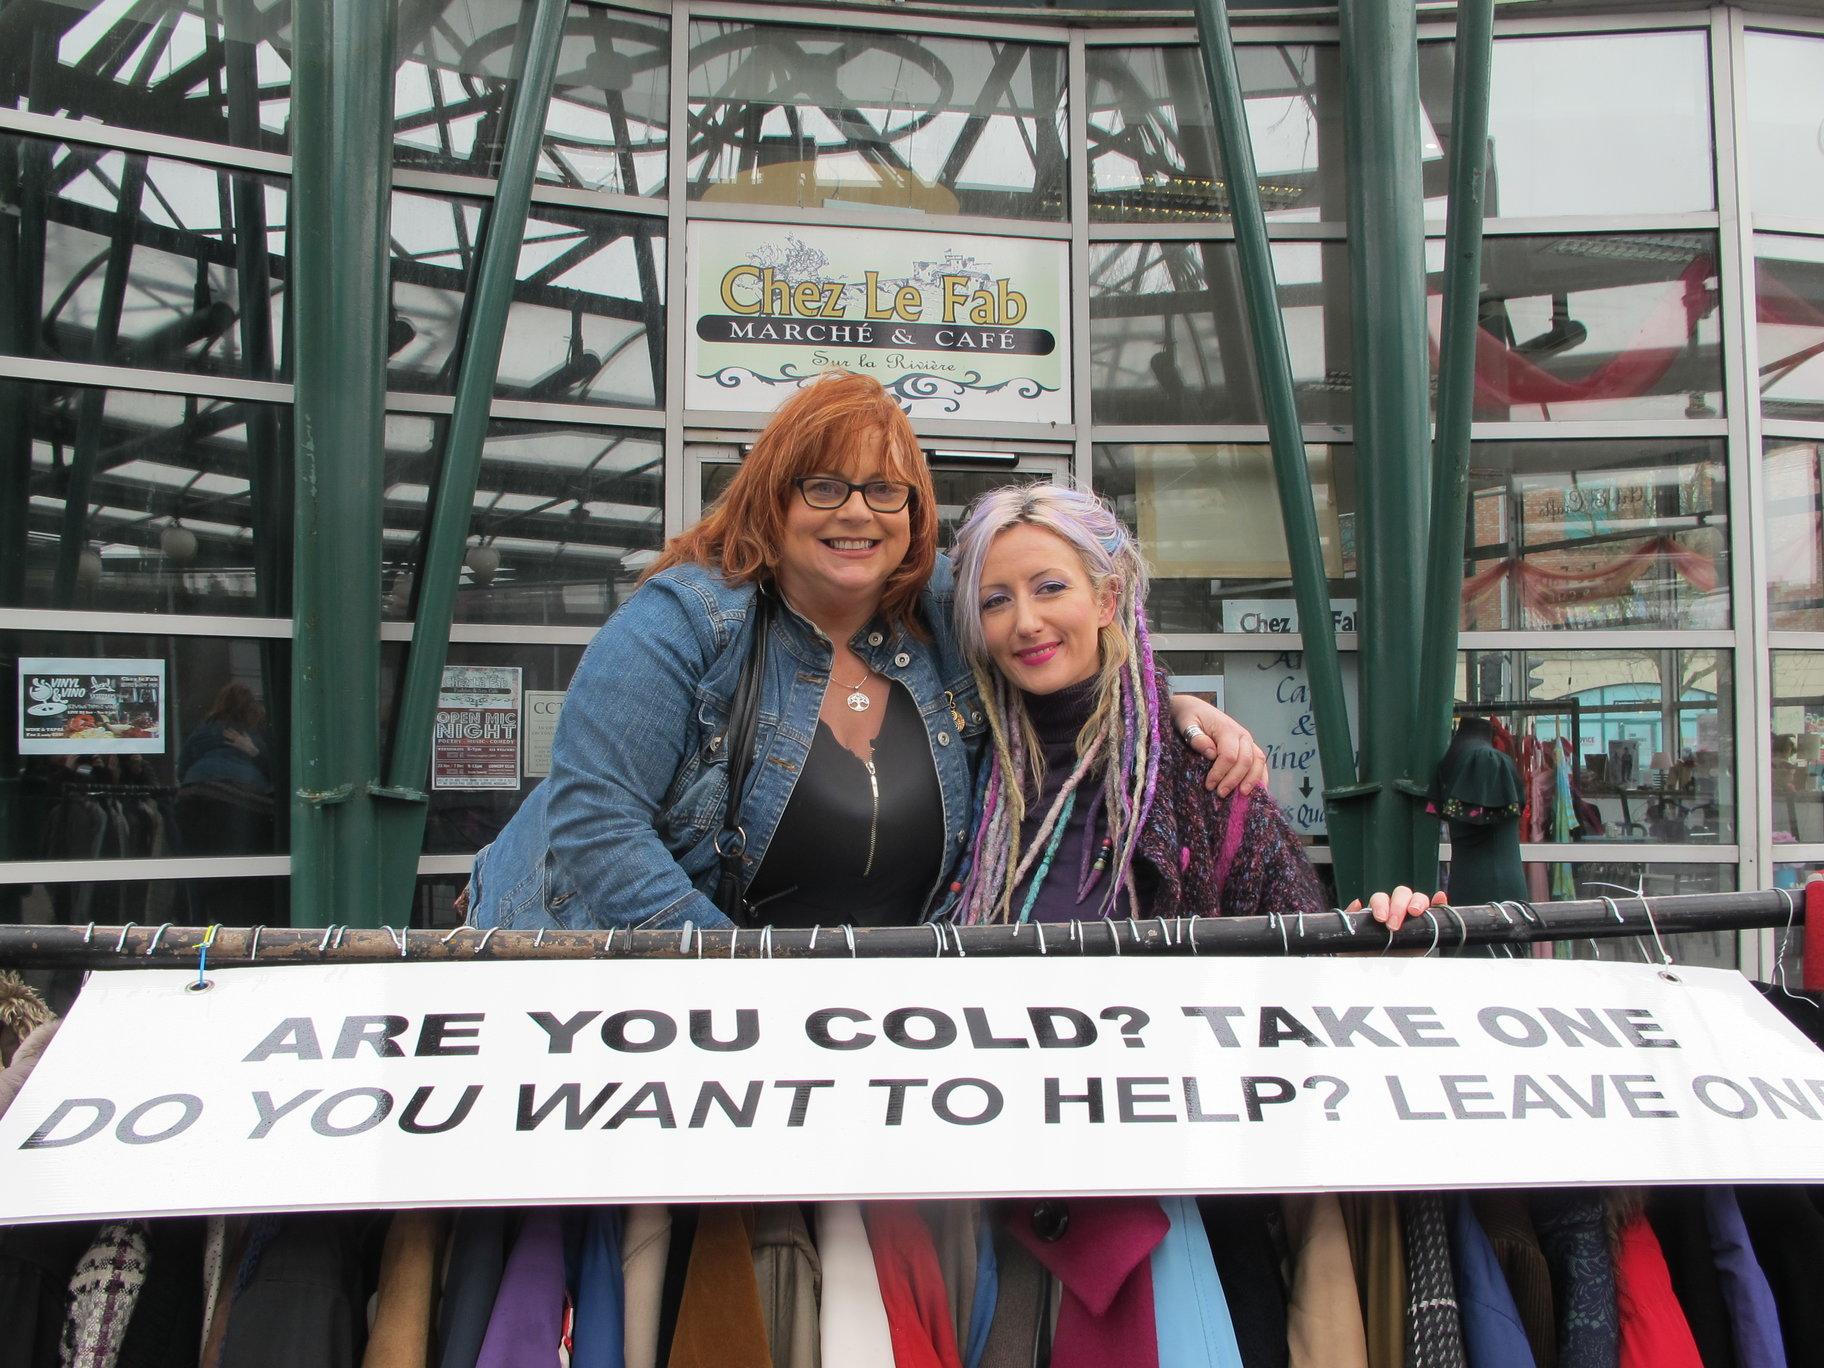 Audrey Ryan #DonateACoat Campaign at Chez le Fab Huge Success